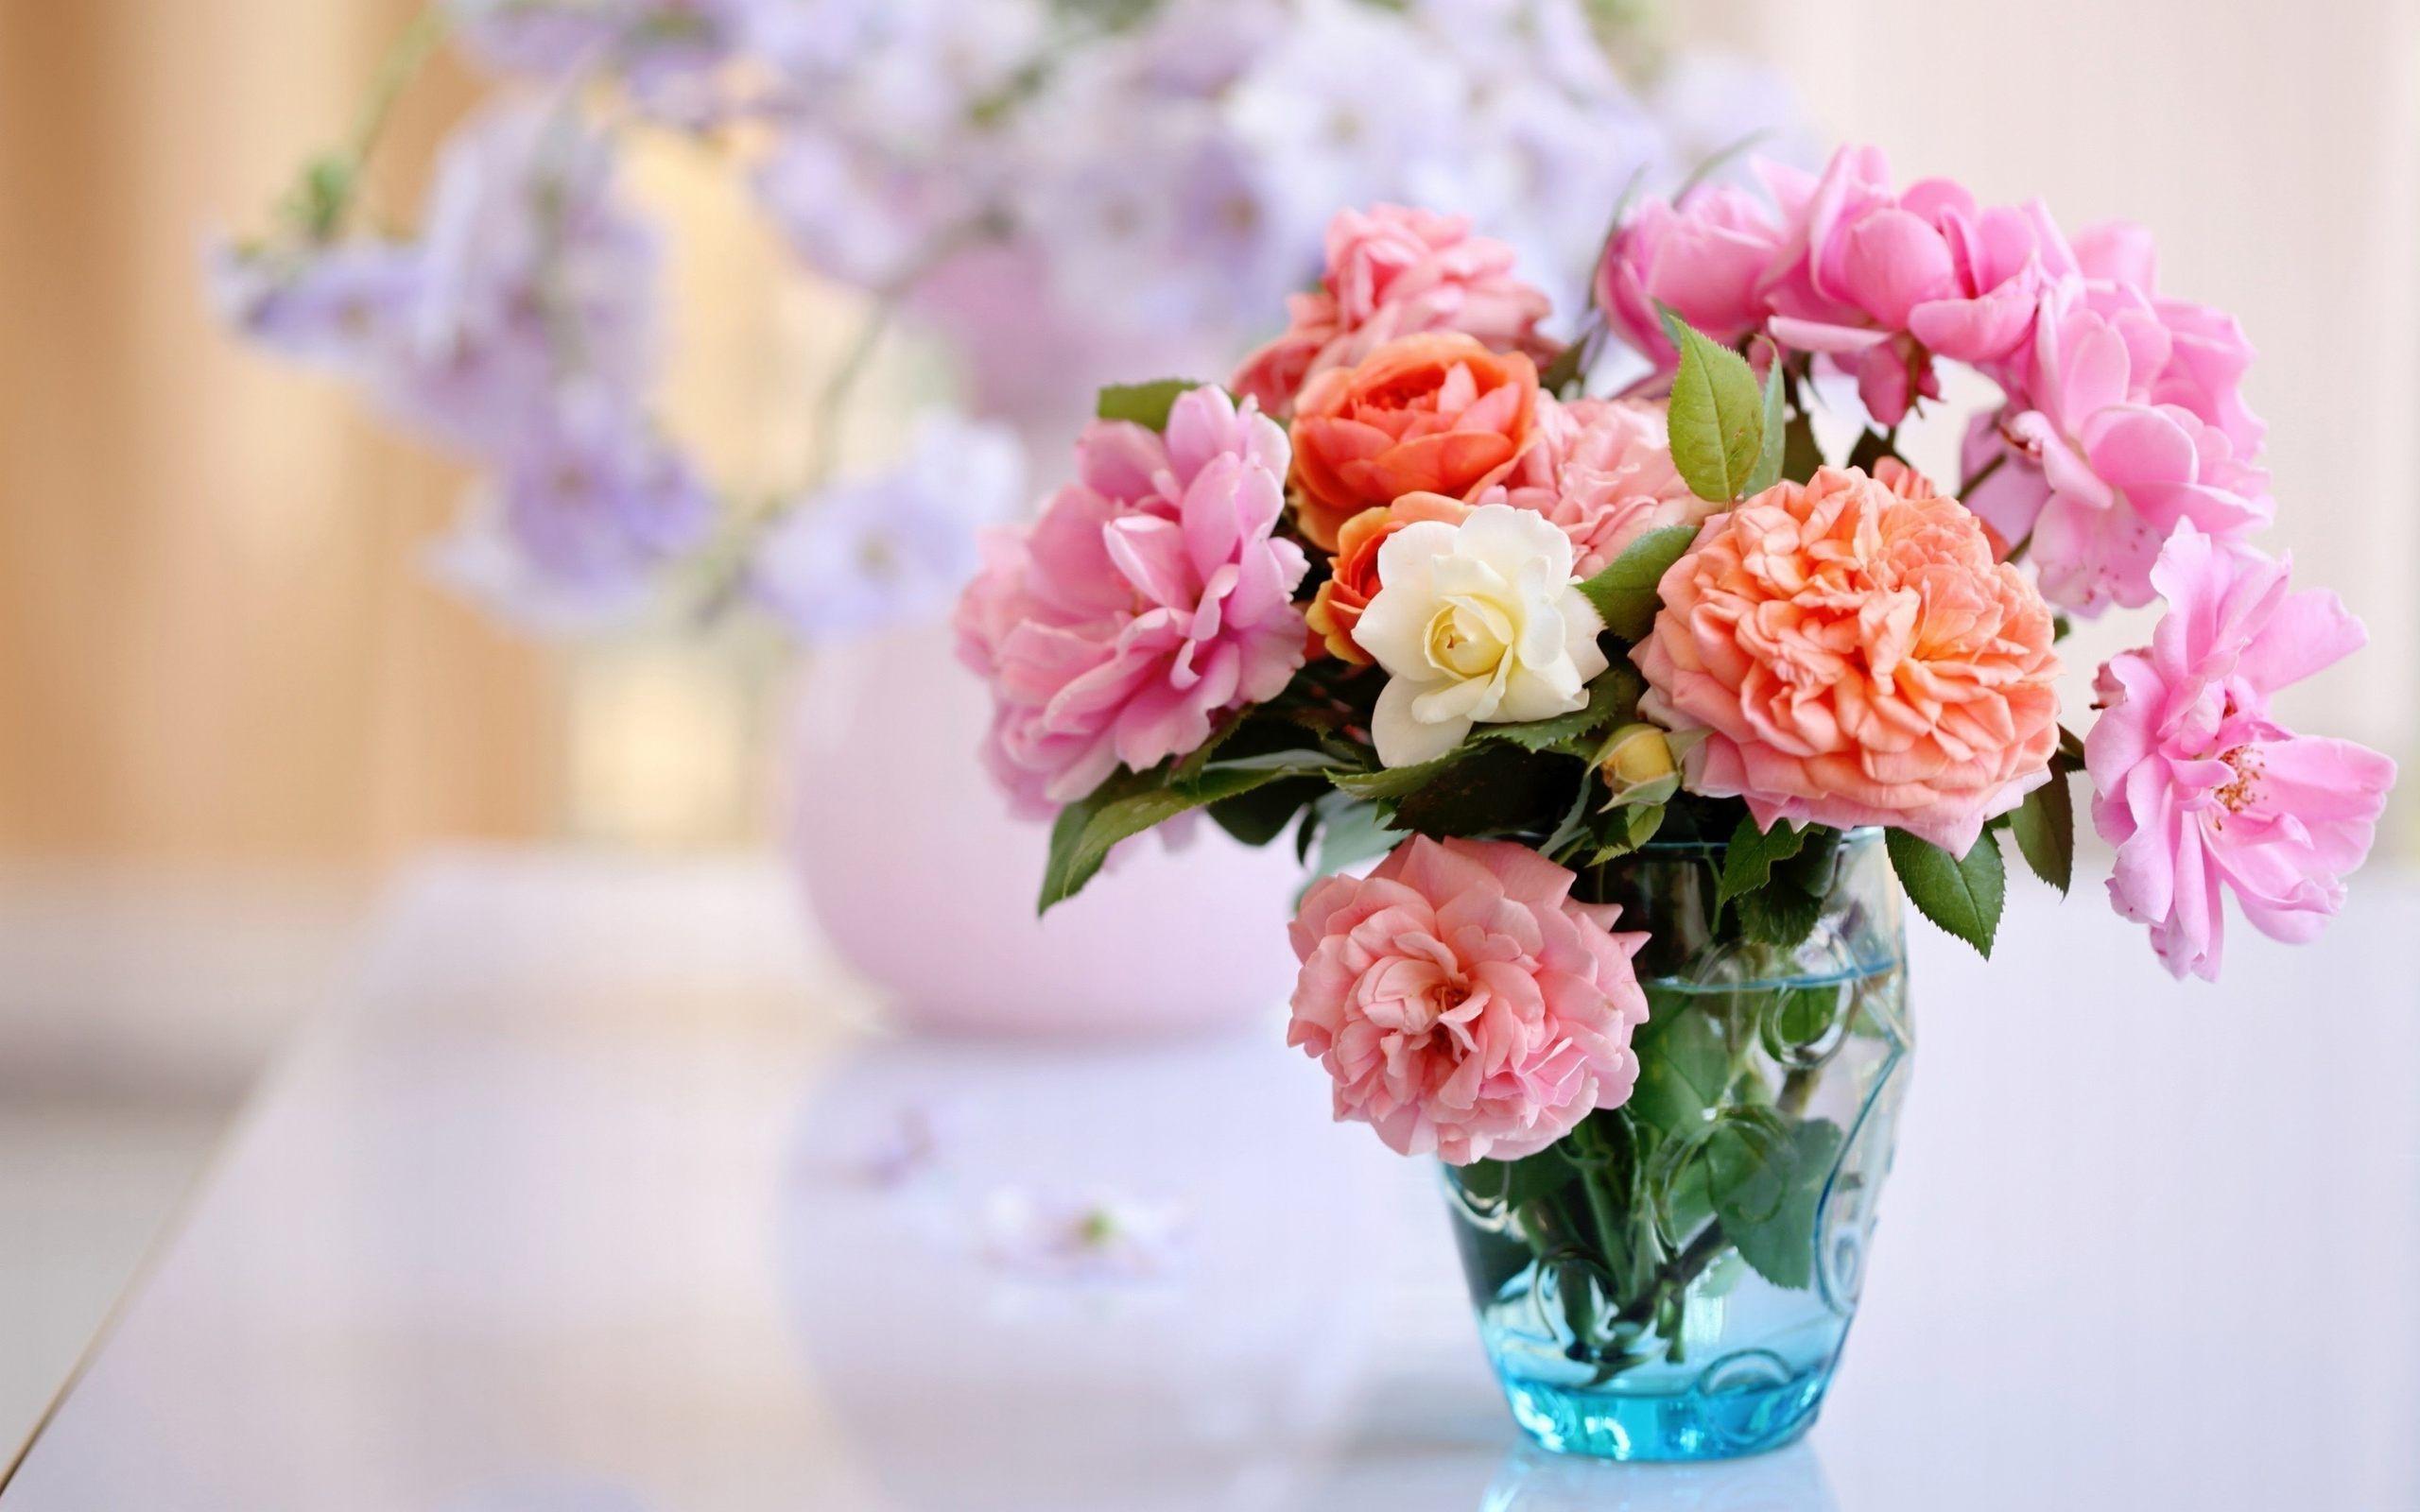 Flower Hd Wallpaper 15 Beautiful Flowers Hd Wallpapers Flower Vases Flowers